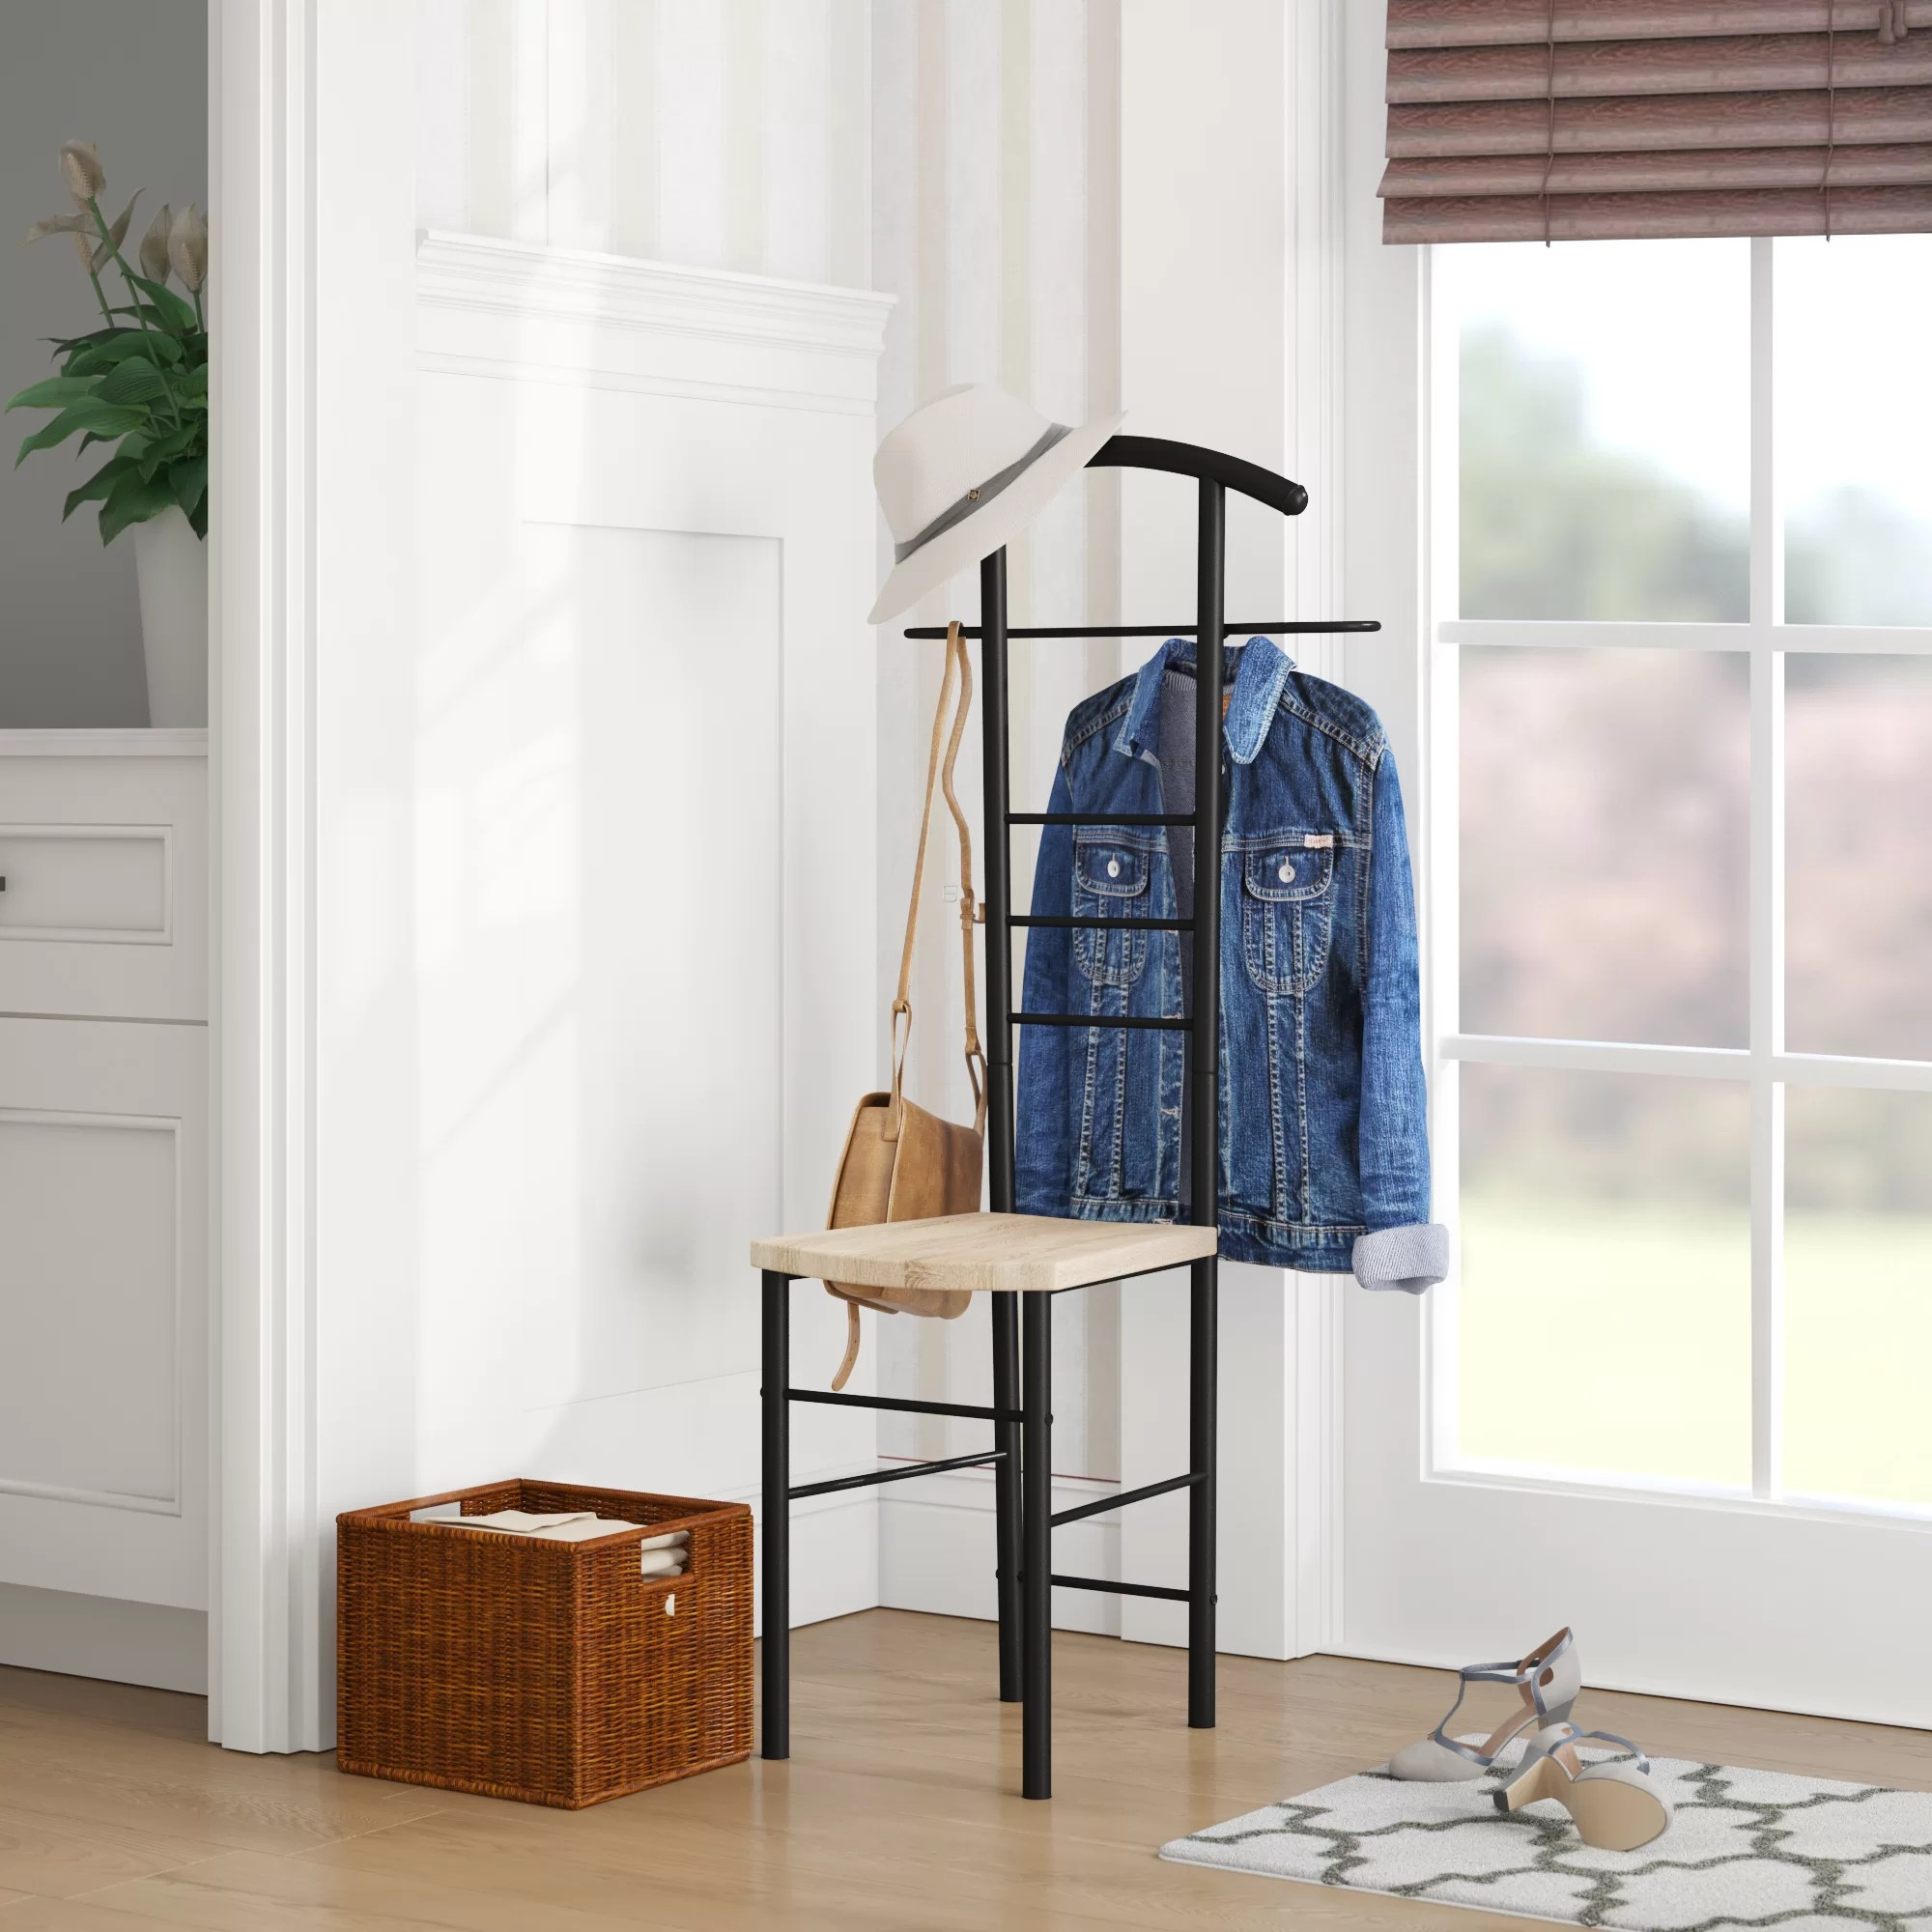 bedroom wardrobe chair valet wicker outdoor dining chairs australia wayfair coombs stand